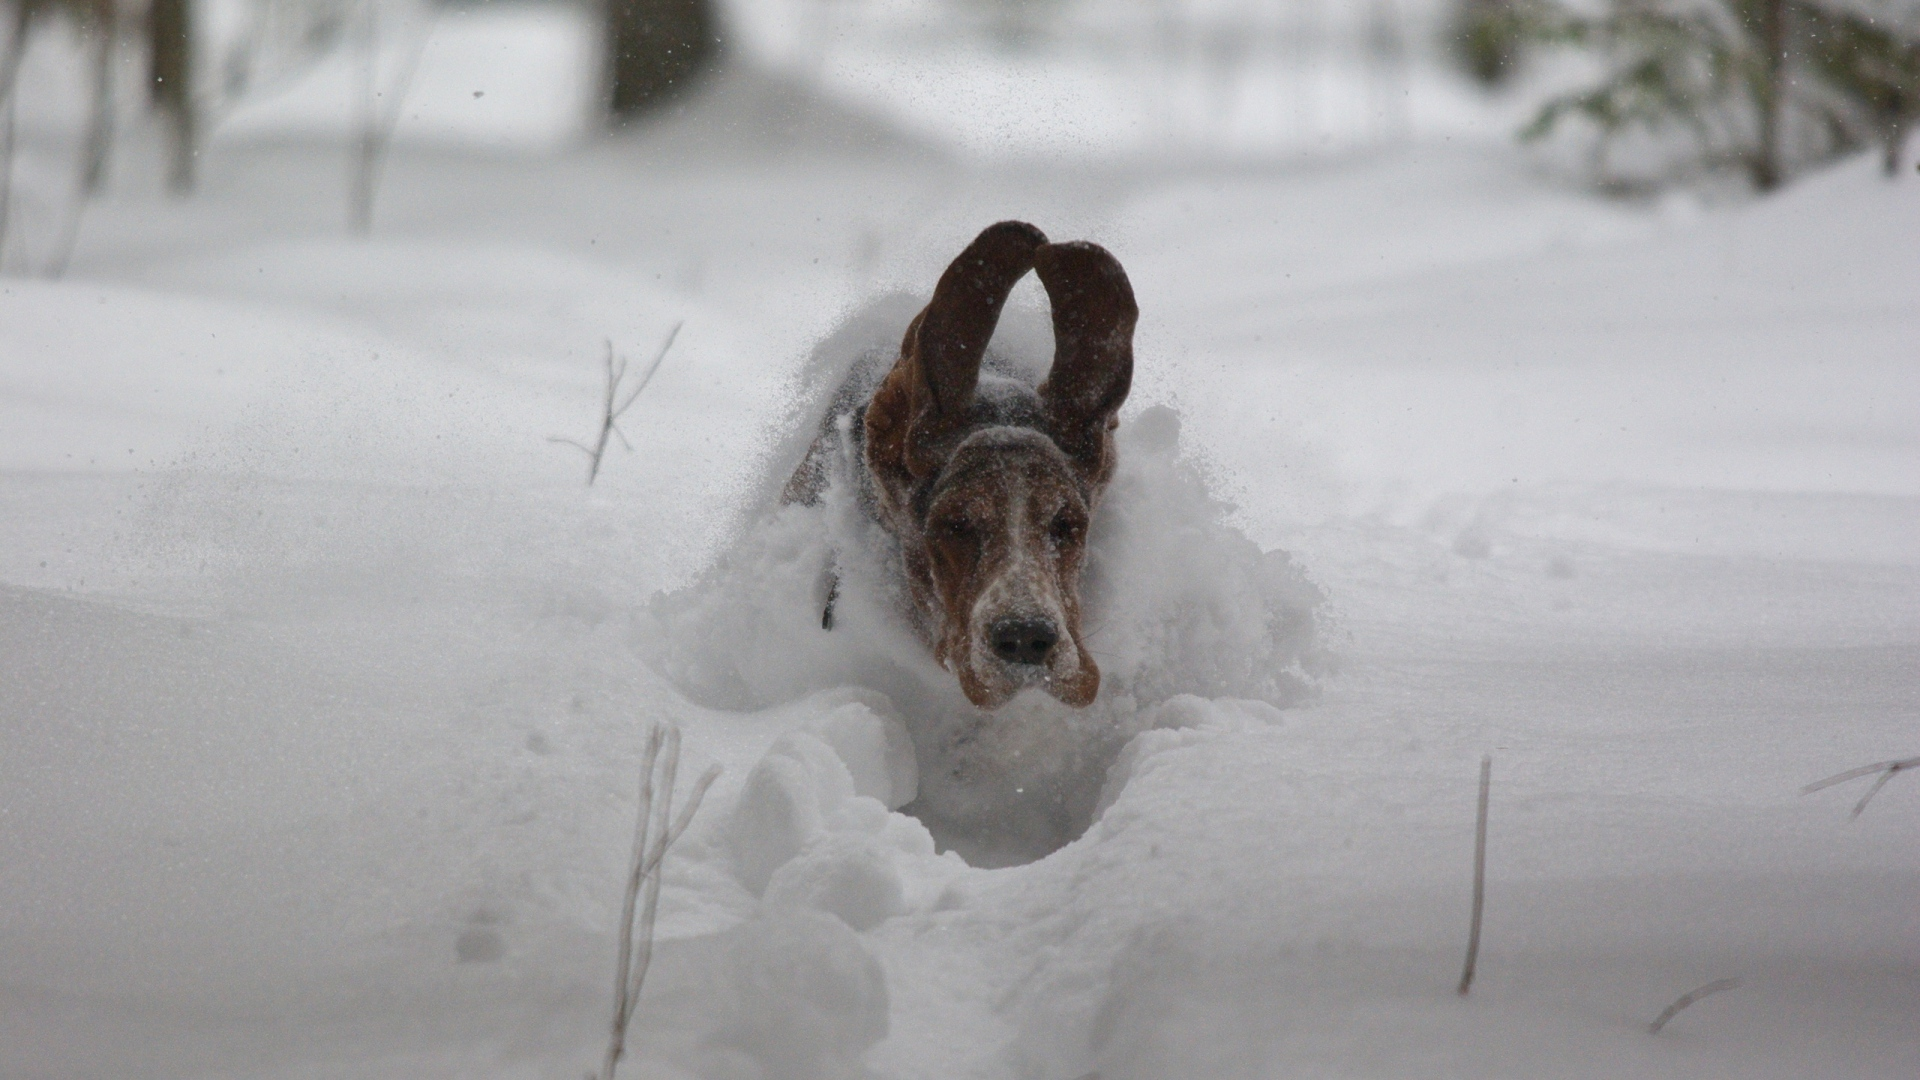 Download Wallpaper 1920x1080 Dog Snow Ears Run Winter Full Hd 1080p Hd Background